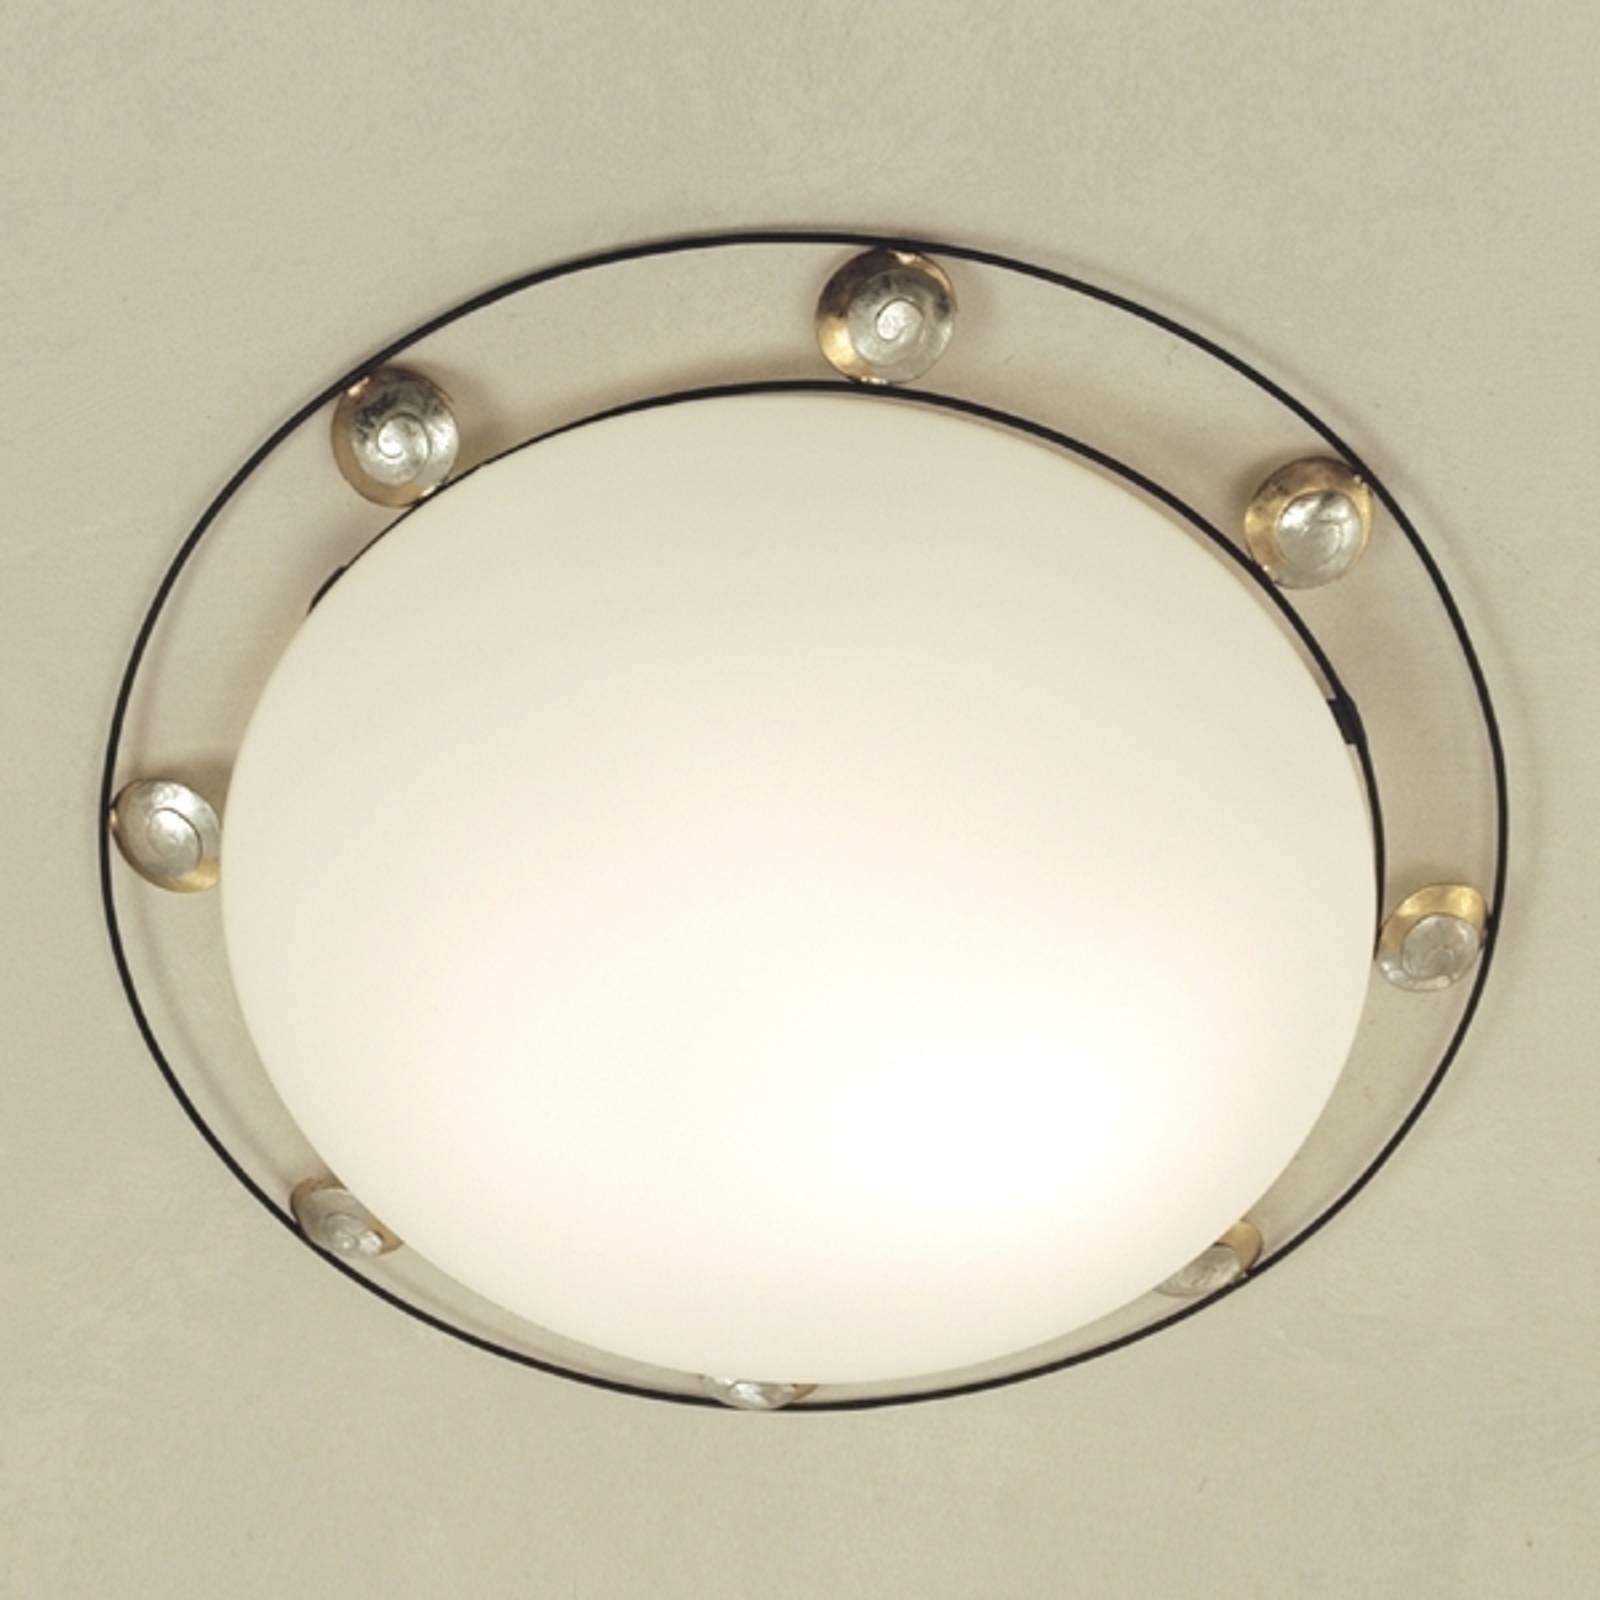 Mooie plafondlamp FRATERNA bruin-goud-zilver